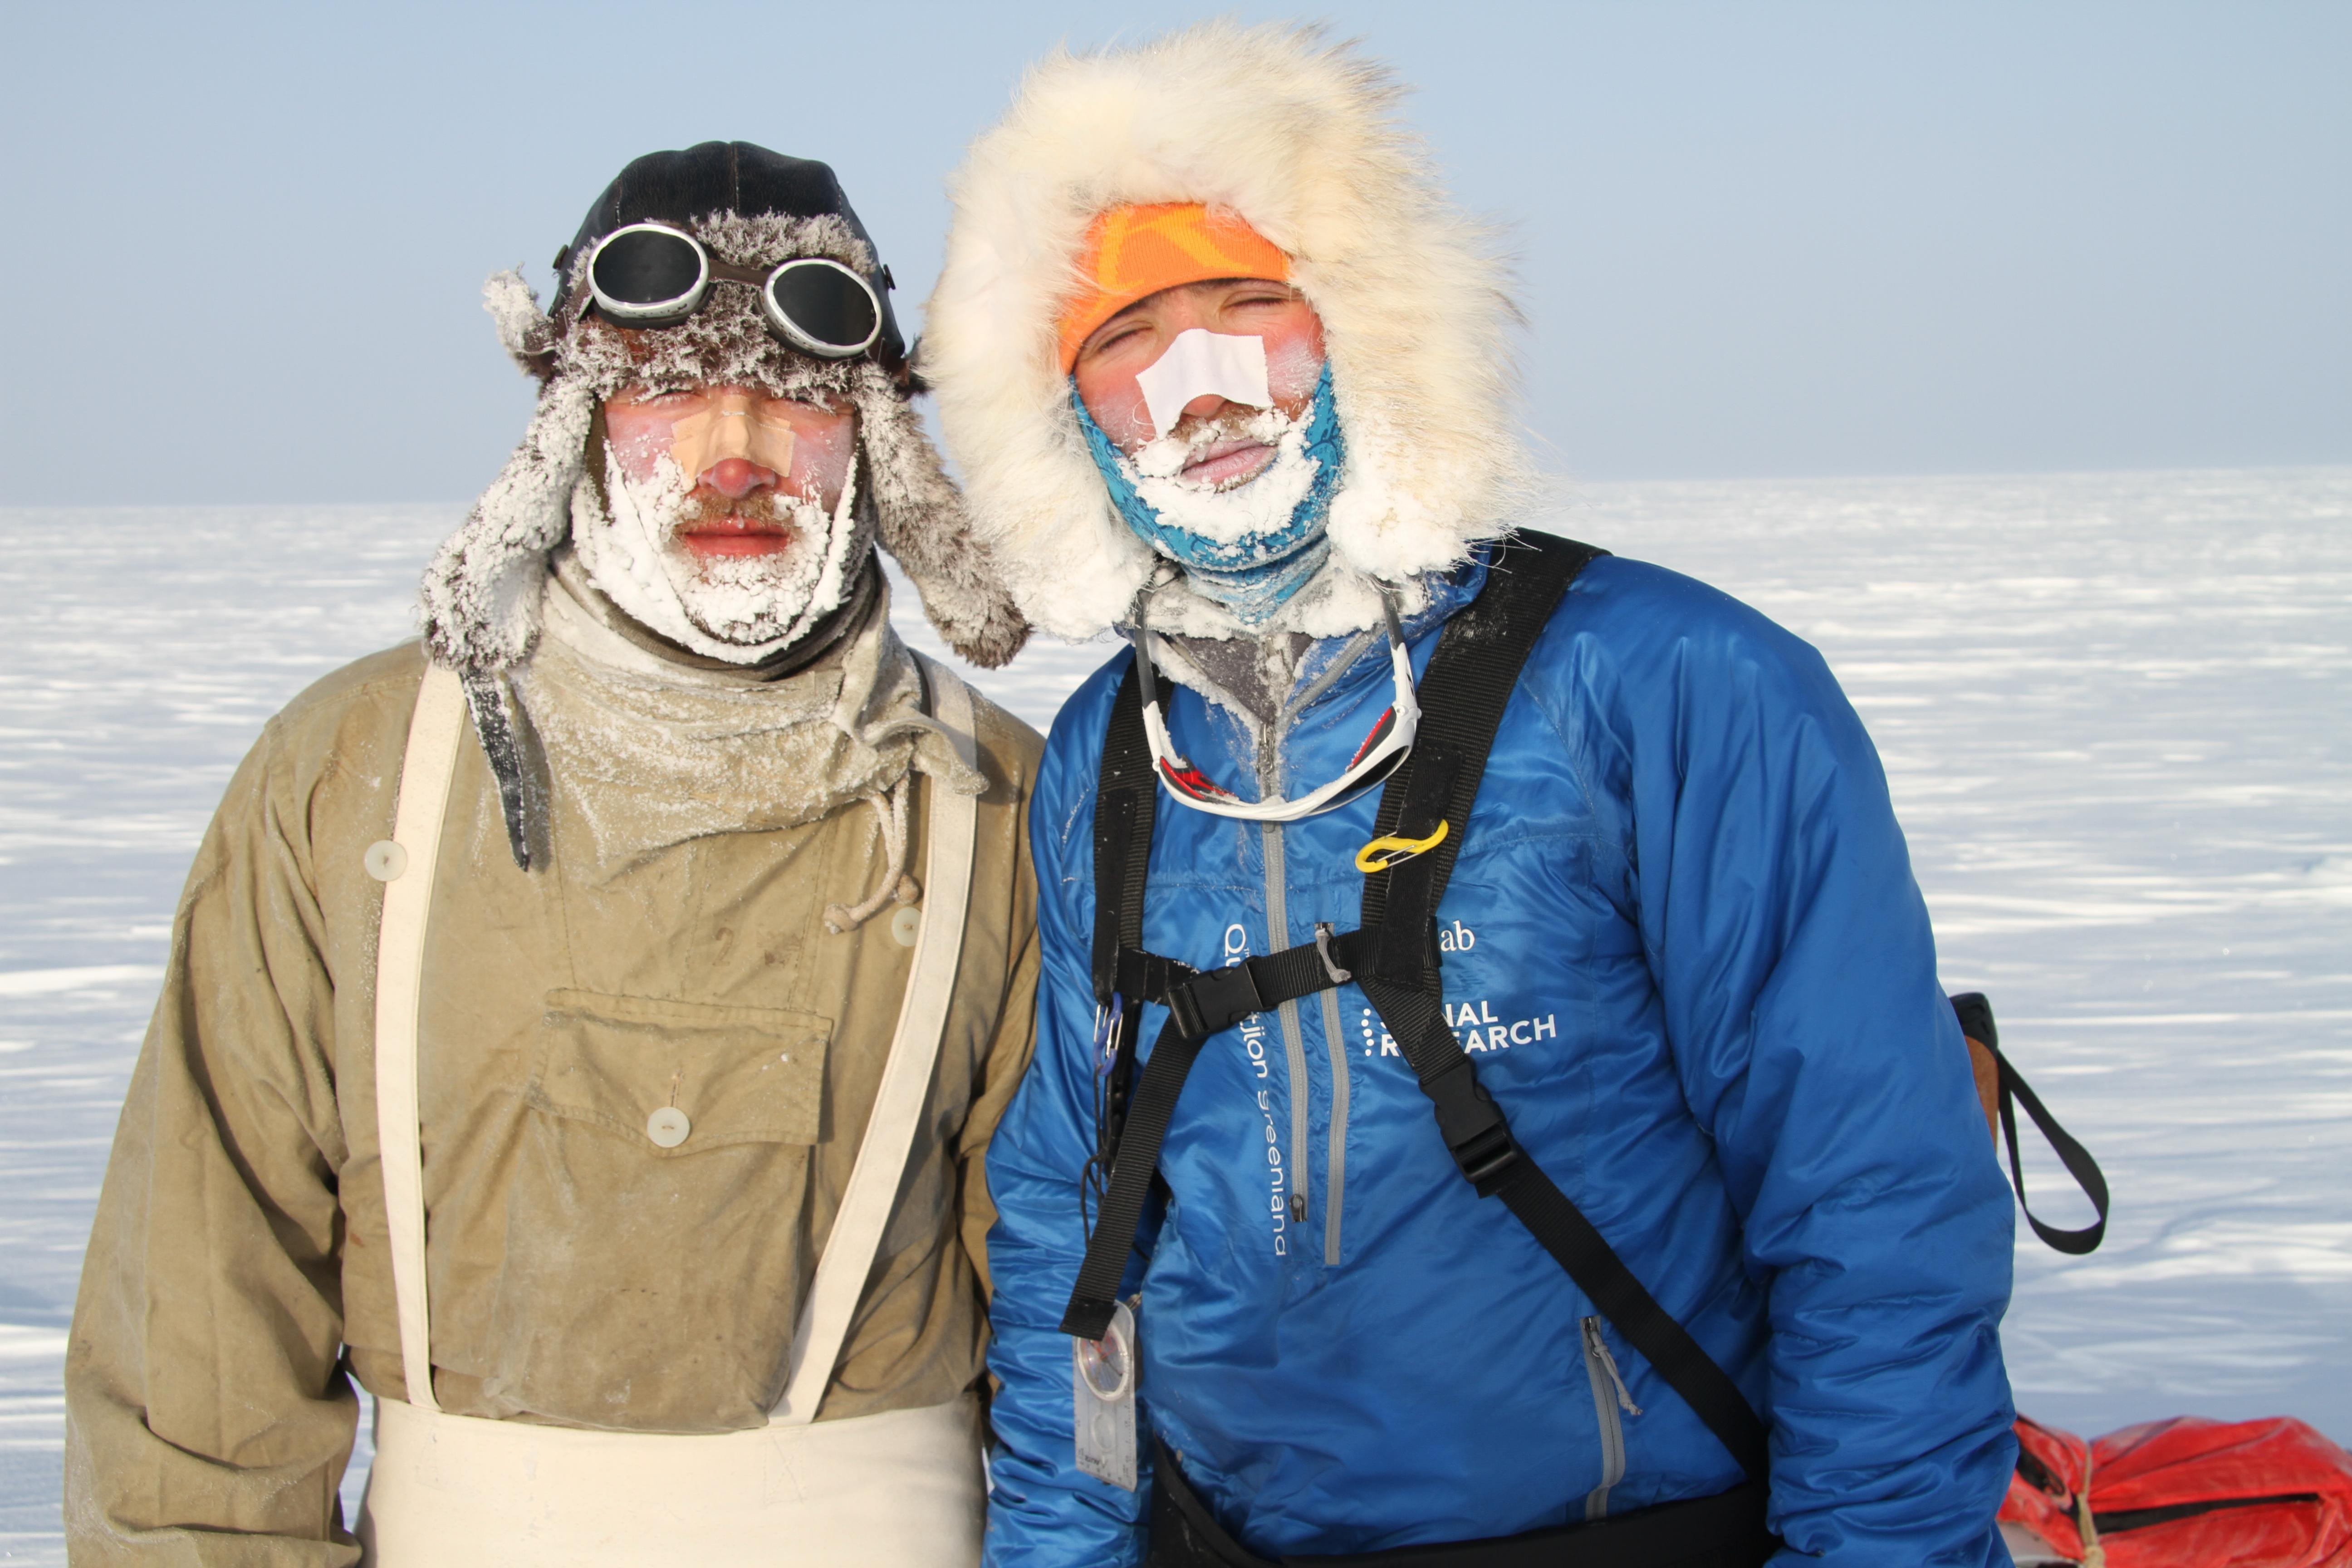 The Turner twins: World first adventurers